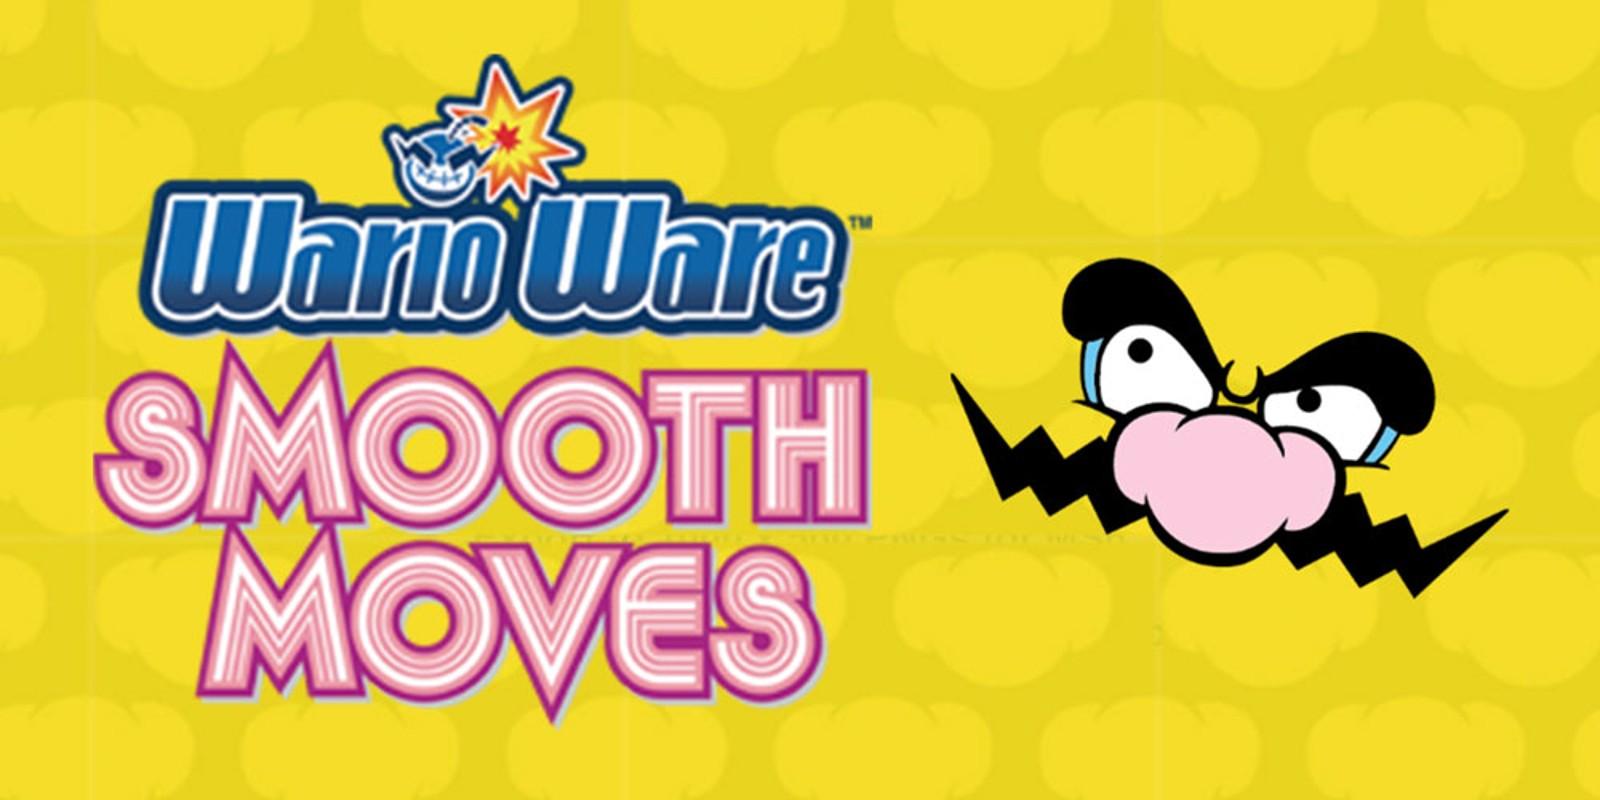 Best WarioWare games: 2. WarioWare: Smooth Moves